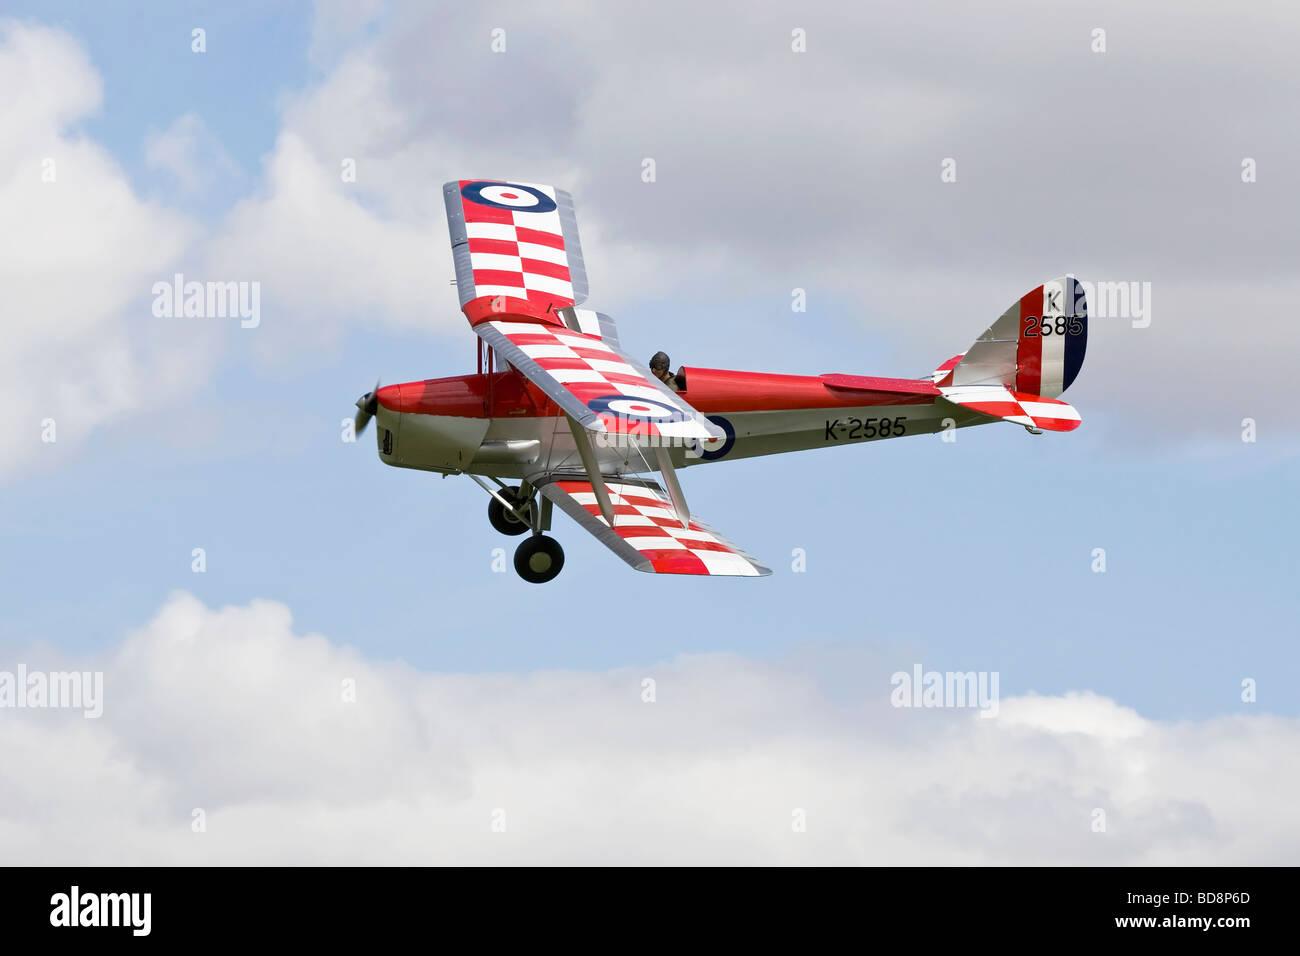 An RAF De Havilland DH82 Tiger Moth biplane trainer - Stock Image